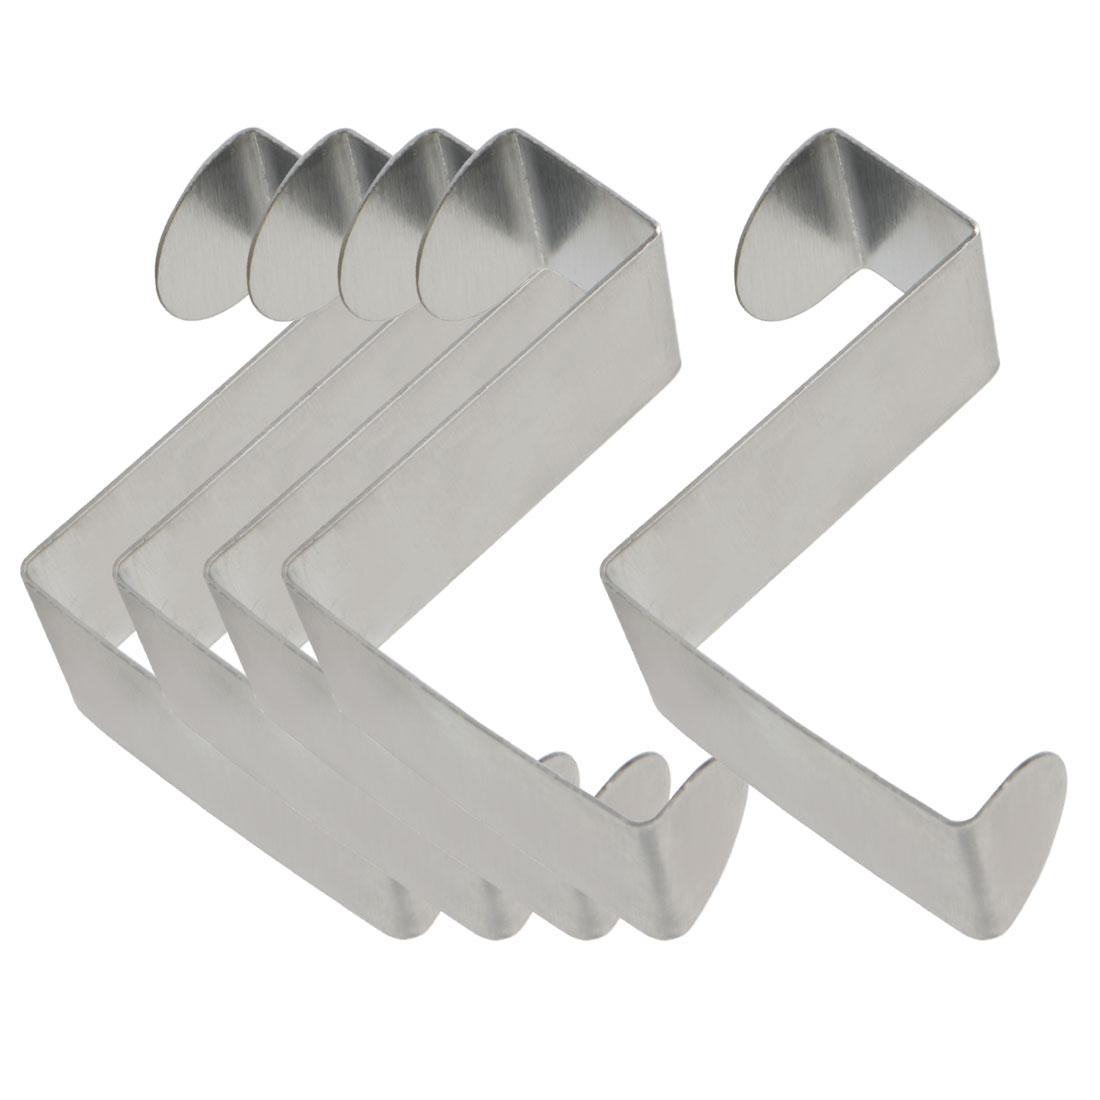 5pcs Z Shaped Hook Stainless Steel for Kitchenware Pot Utensils Coat Holders